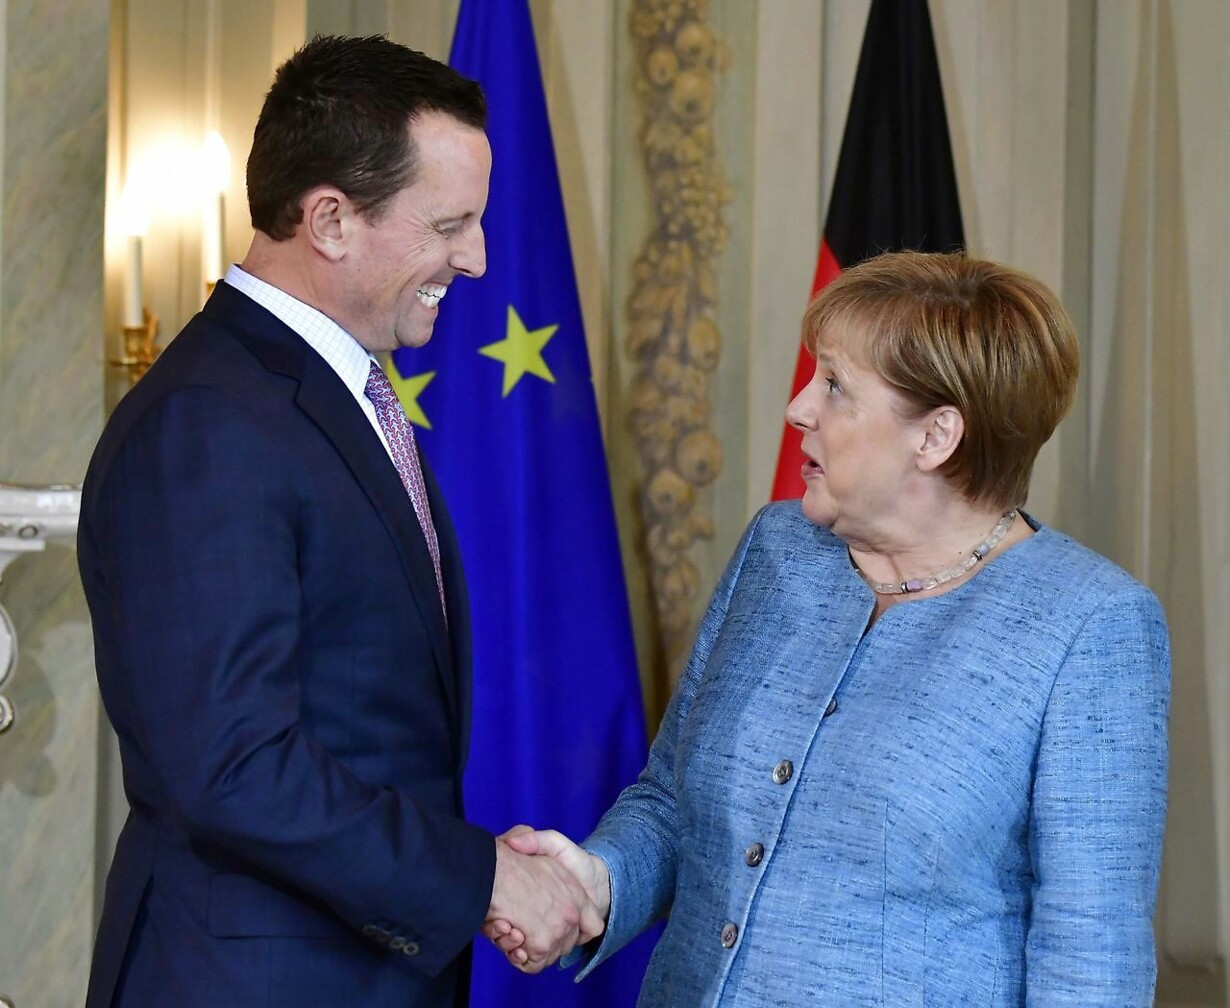 FILES-GERMANY-US-DIPLOMACY-NATO-DEFENCE